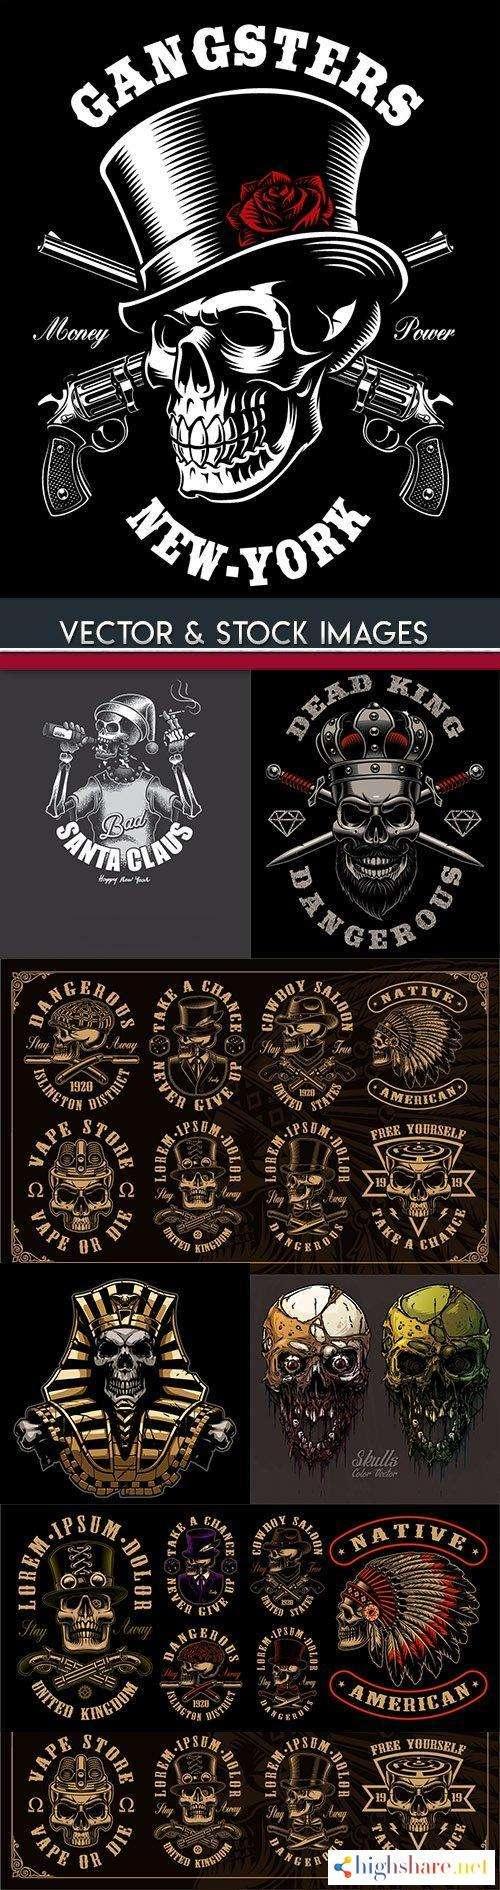 skull and accessories grunge label drawn design 7 5f4270ad35b6e - Skull and accessories grunge label drawn design 7